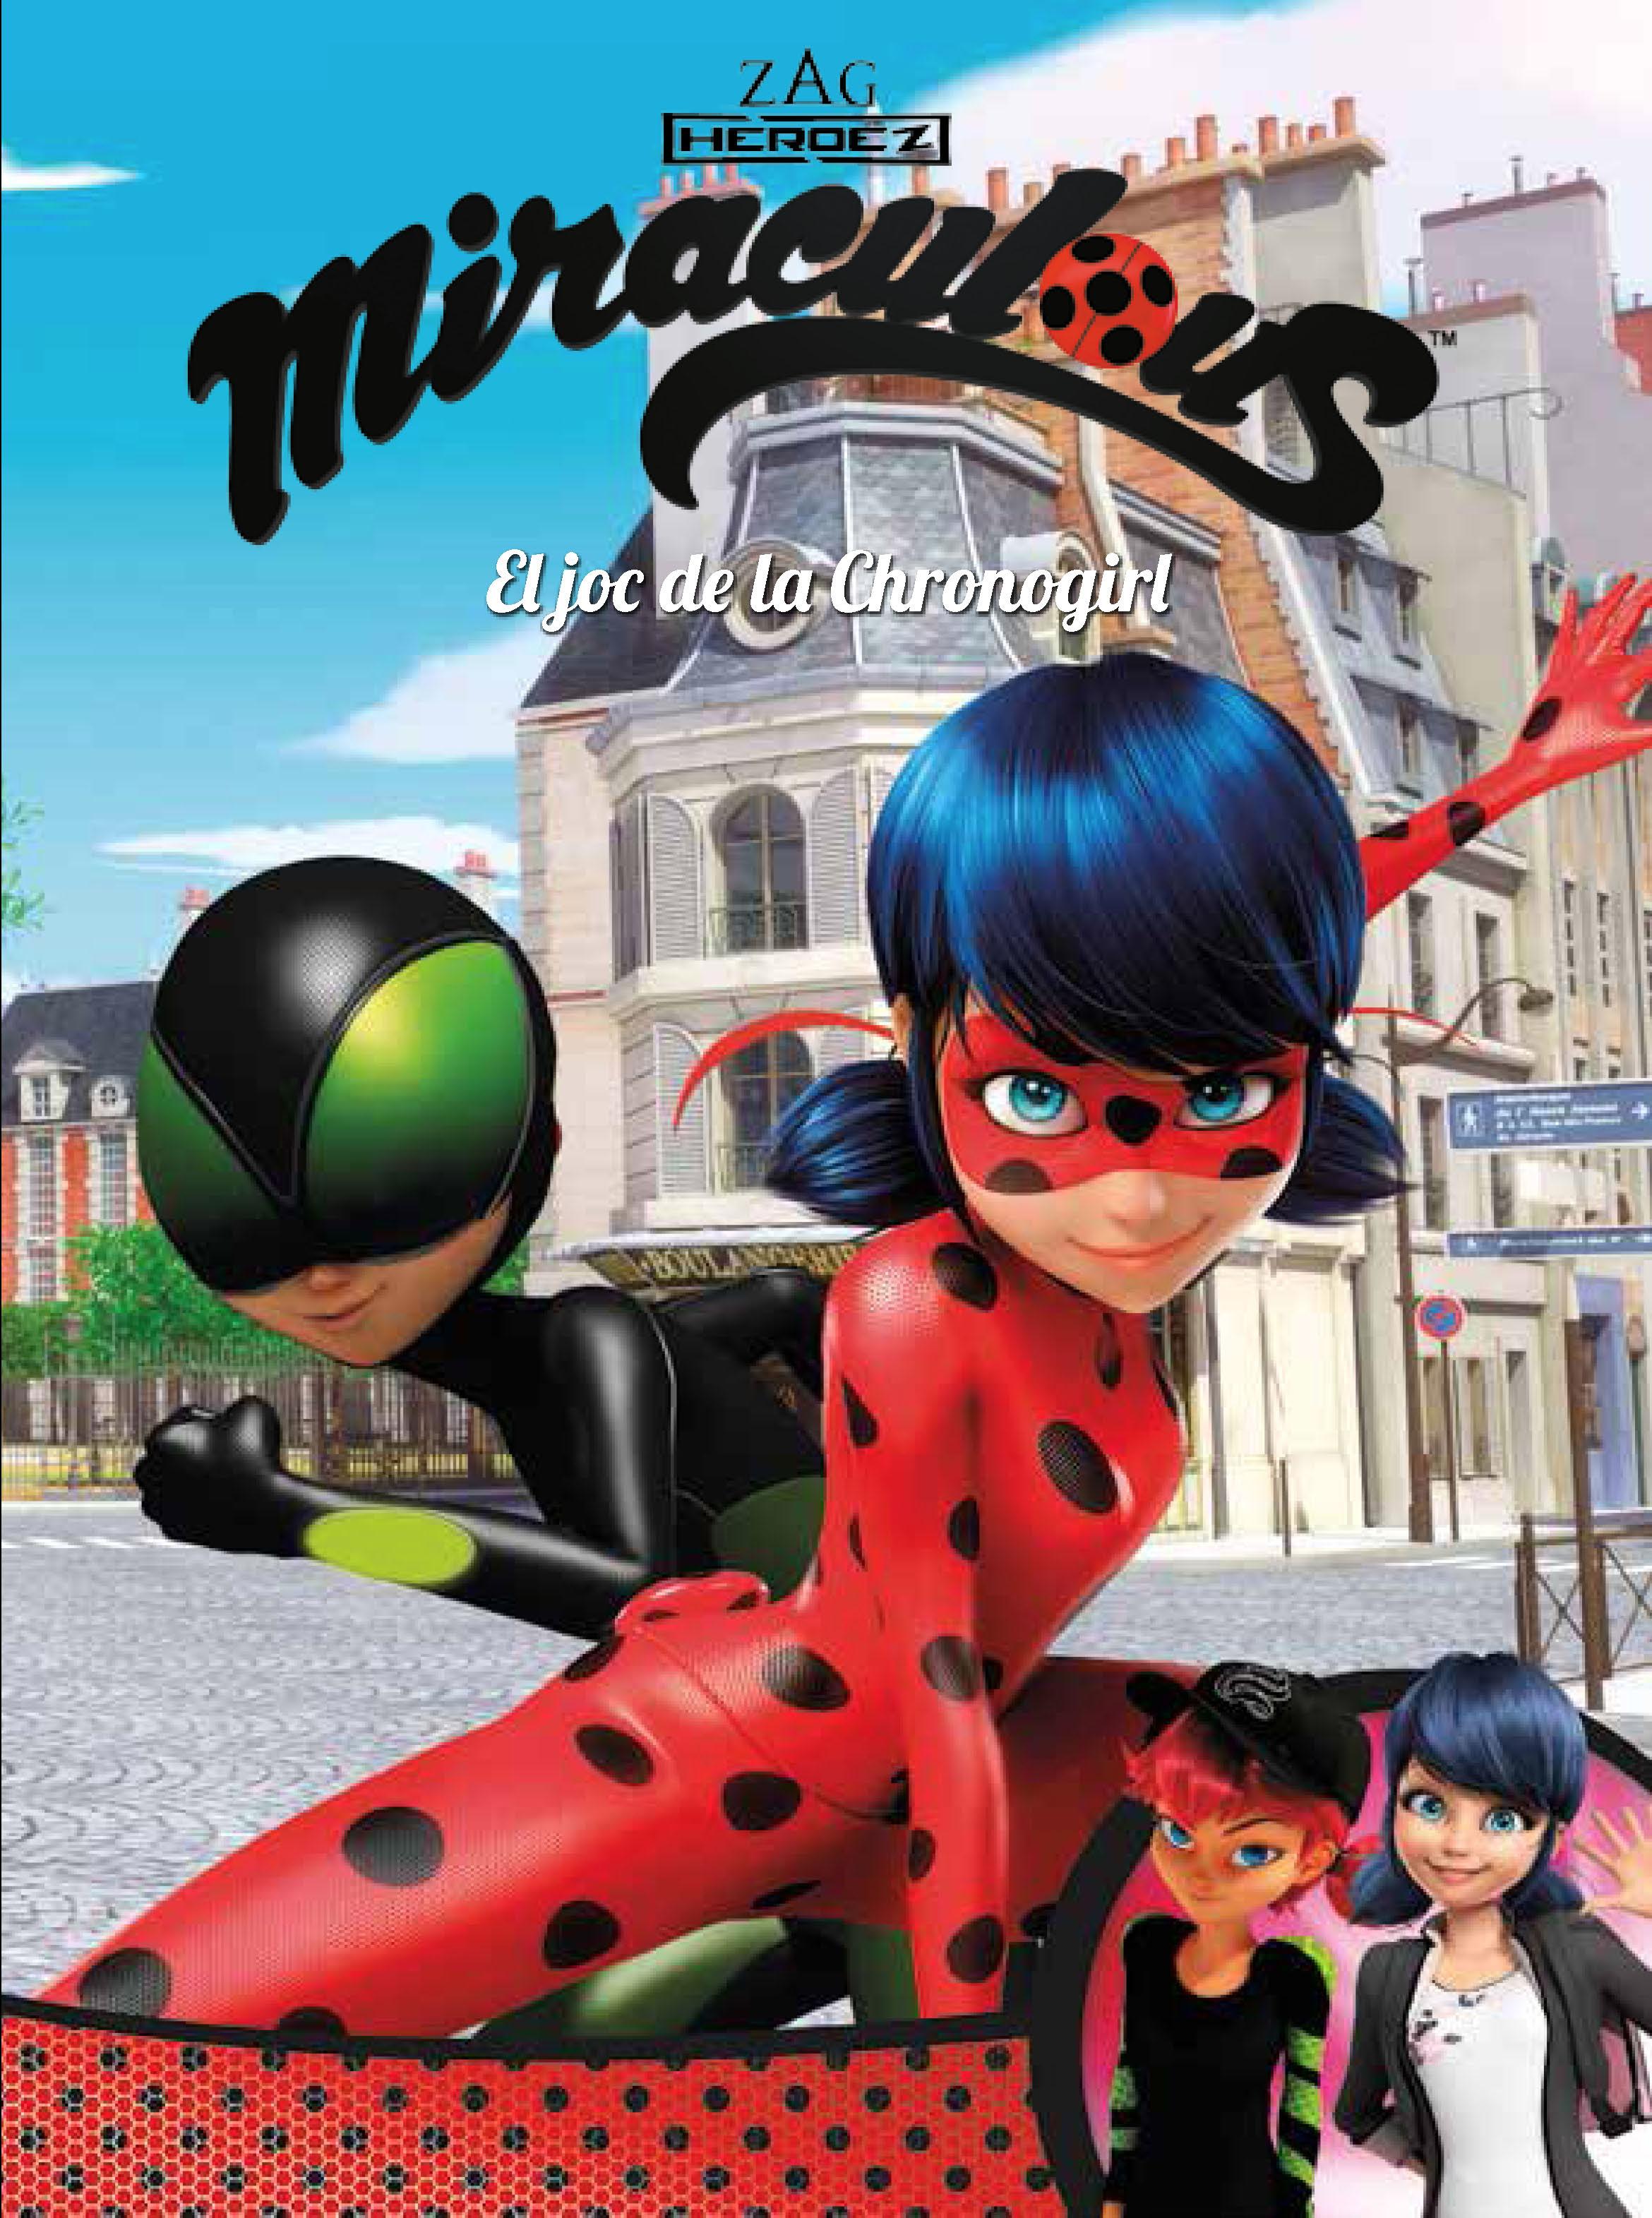 El joc de la chronogirl  (miraculous [prodigiosa ladybug]. Còmic) (Tapa dura)